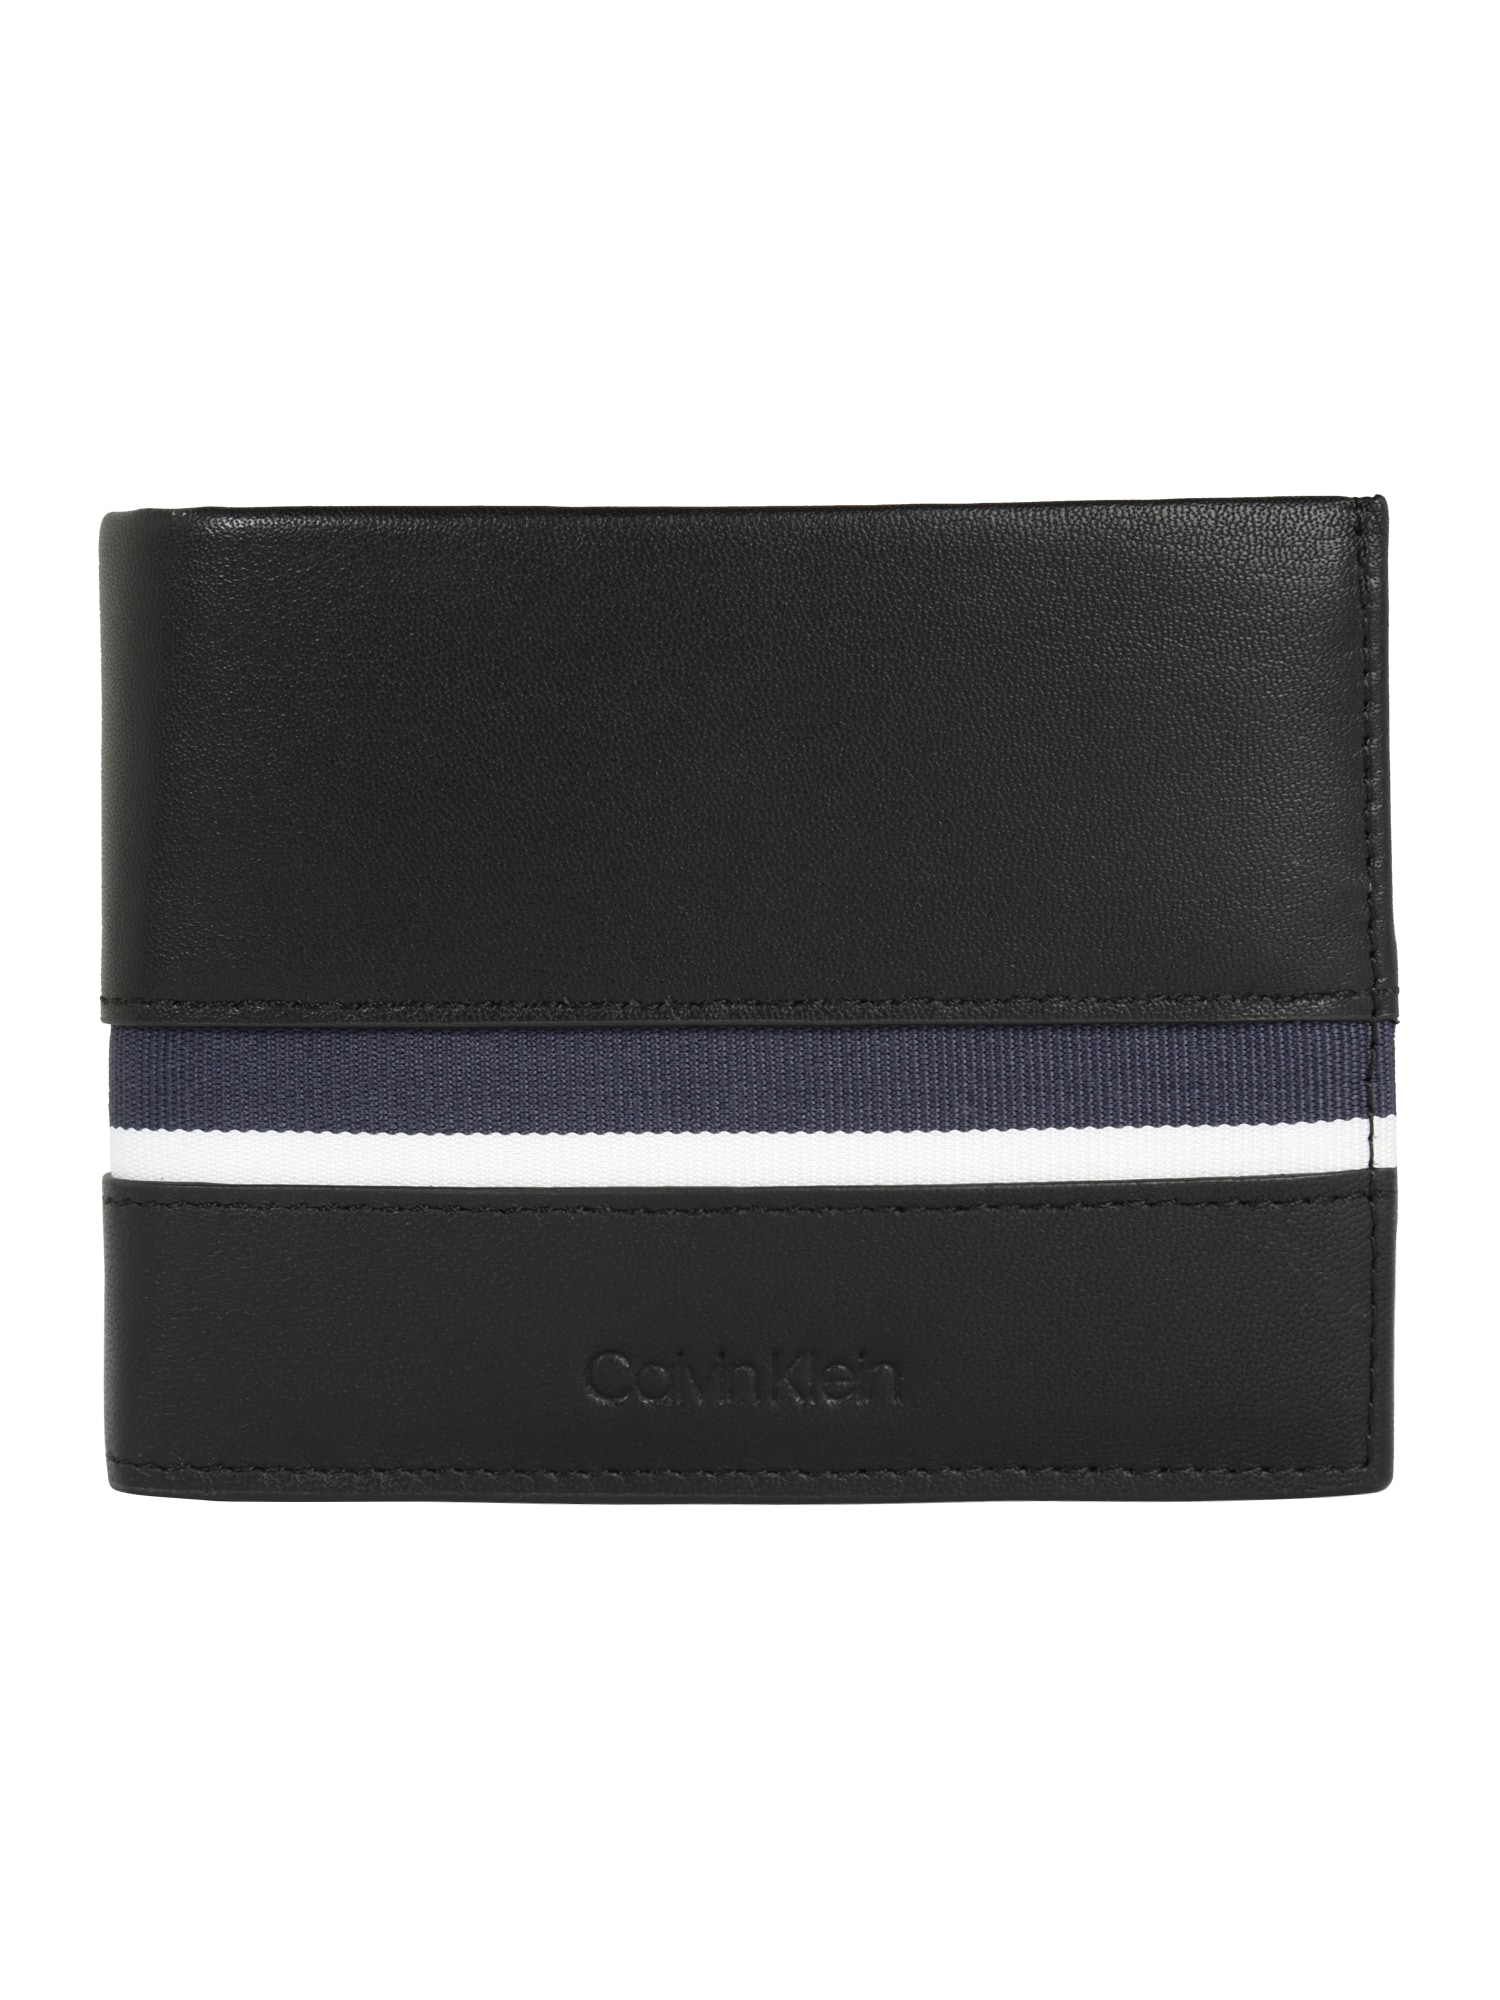 fc820727639 Calvin Klein Heren Portemonnee Stripe 5Cc Coin Zwart calvin klein kopen in  de aanbieding